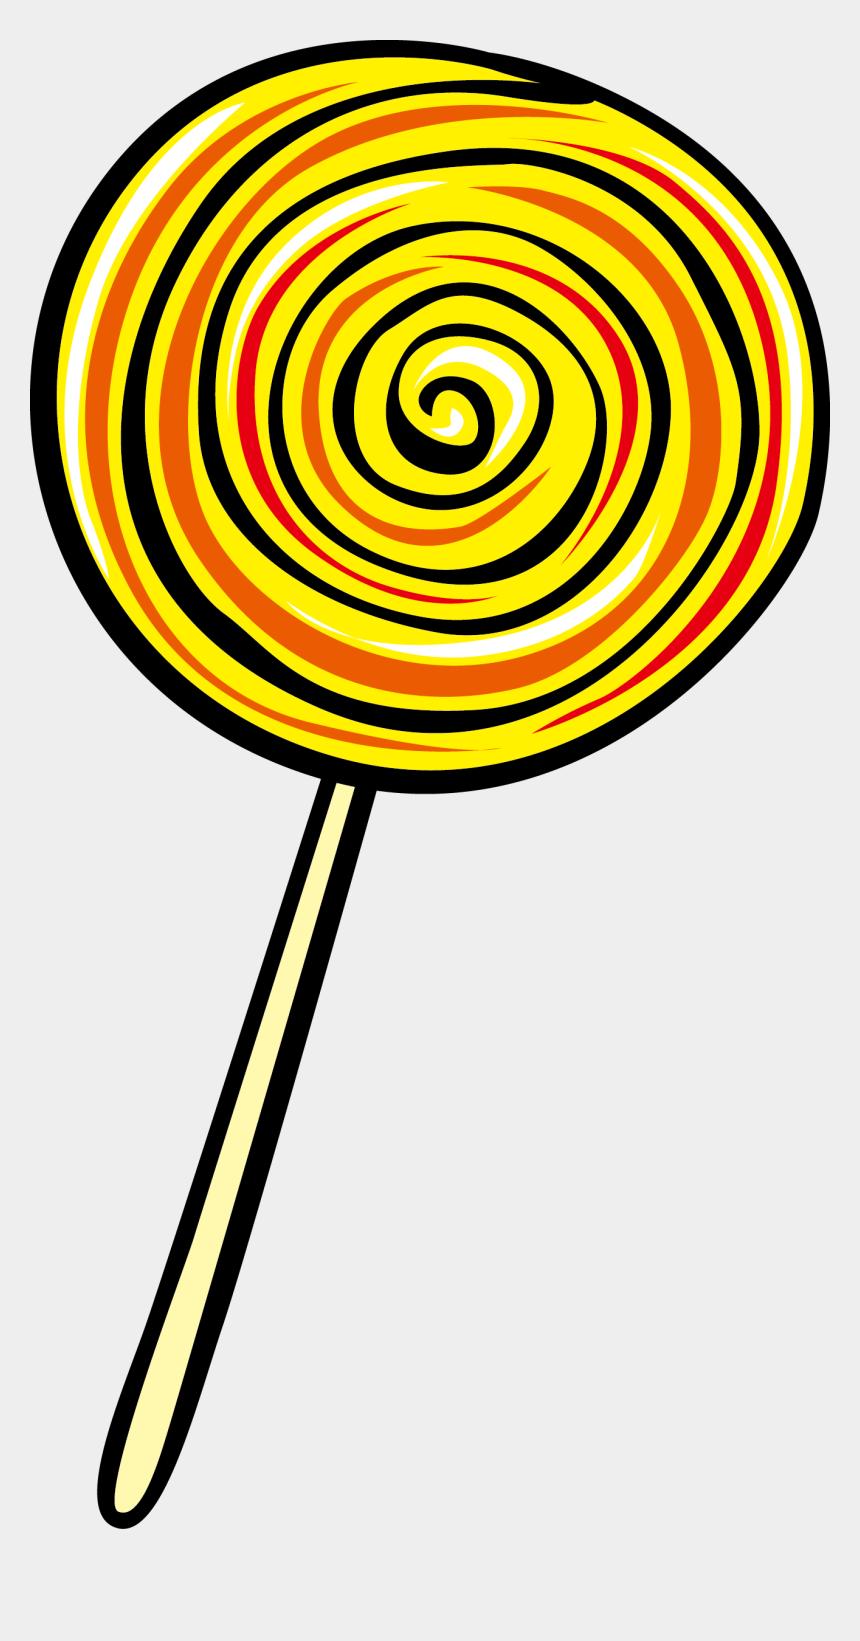 lollipop clipart, Cartoons - Lollipop Clipart Png - Yellow Lollipop Clipart